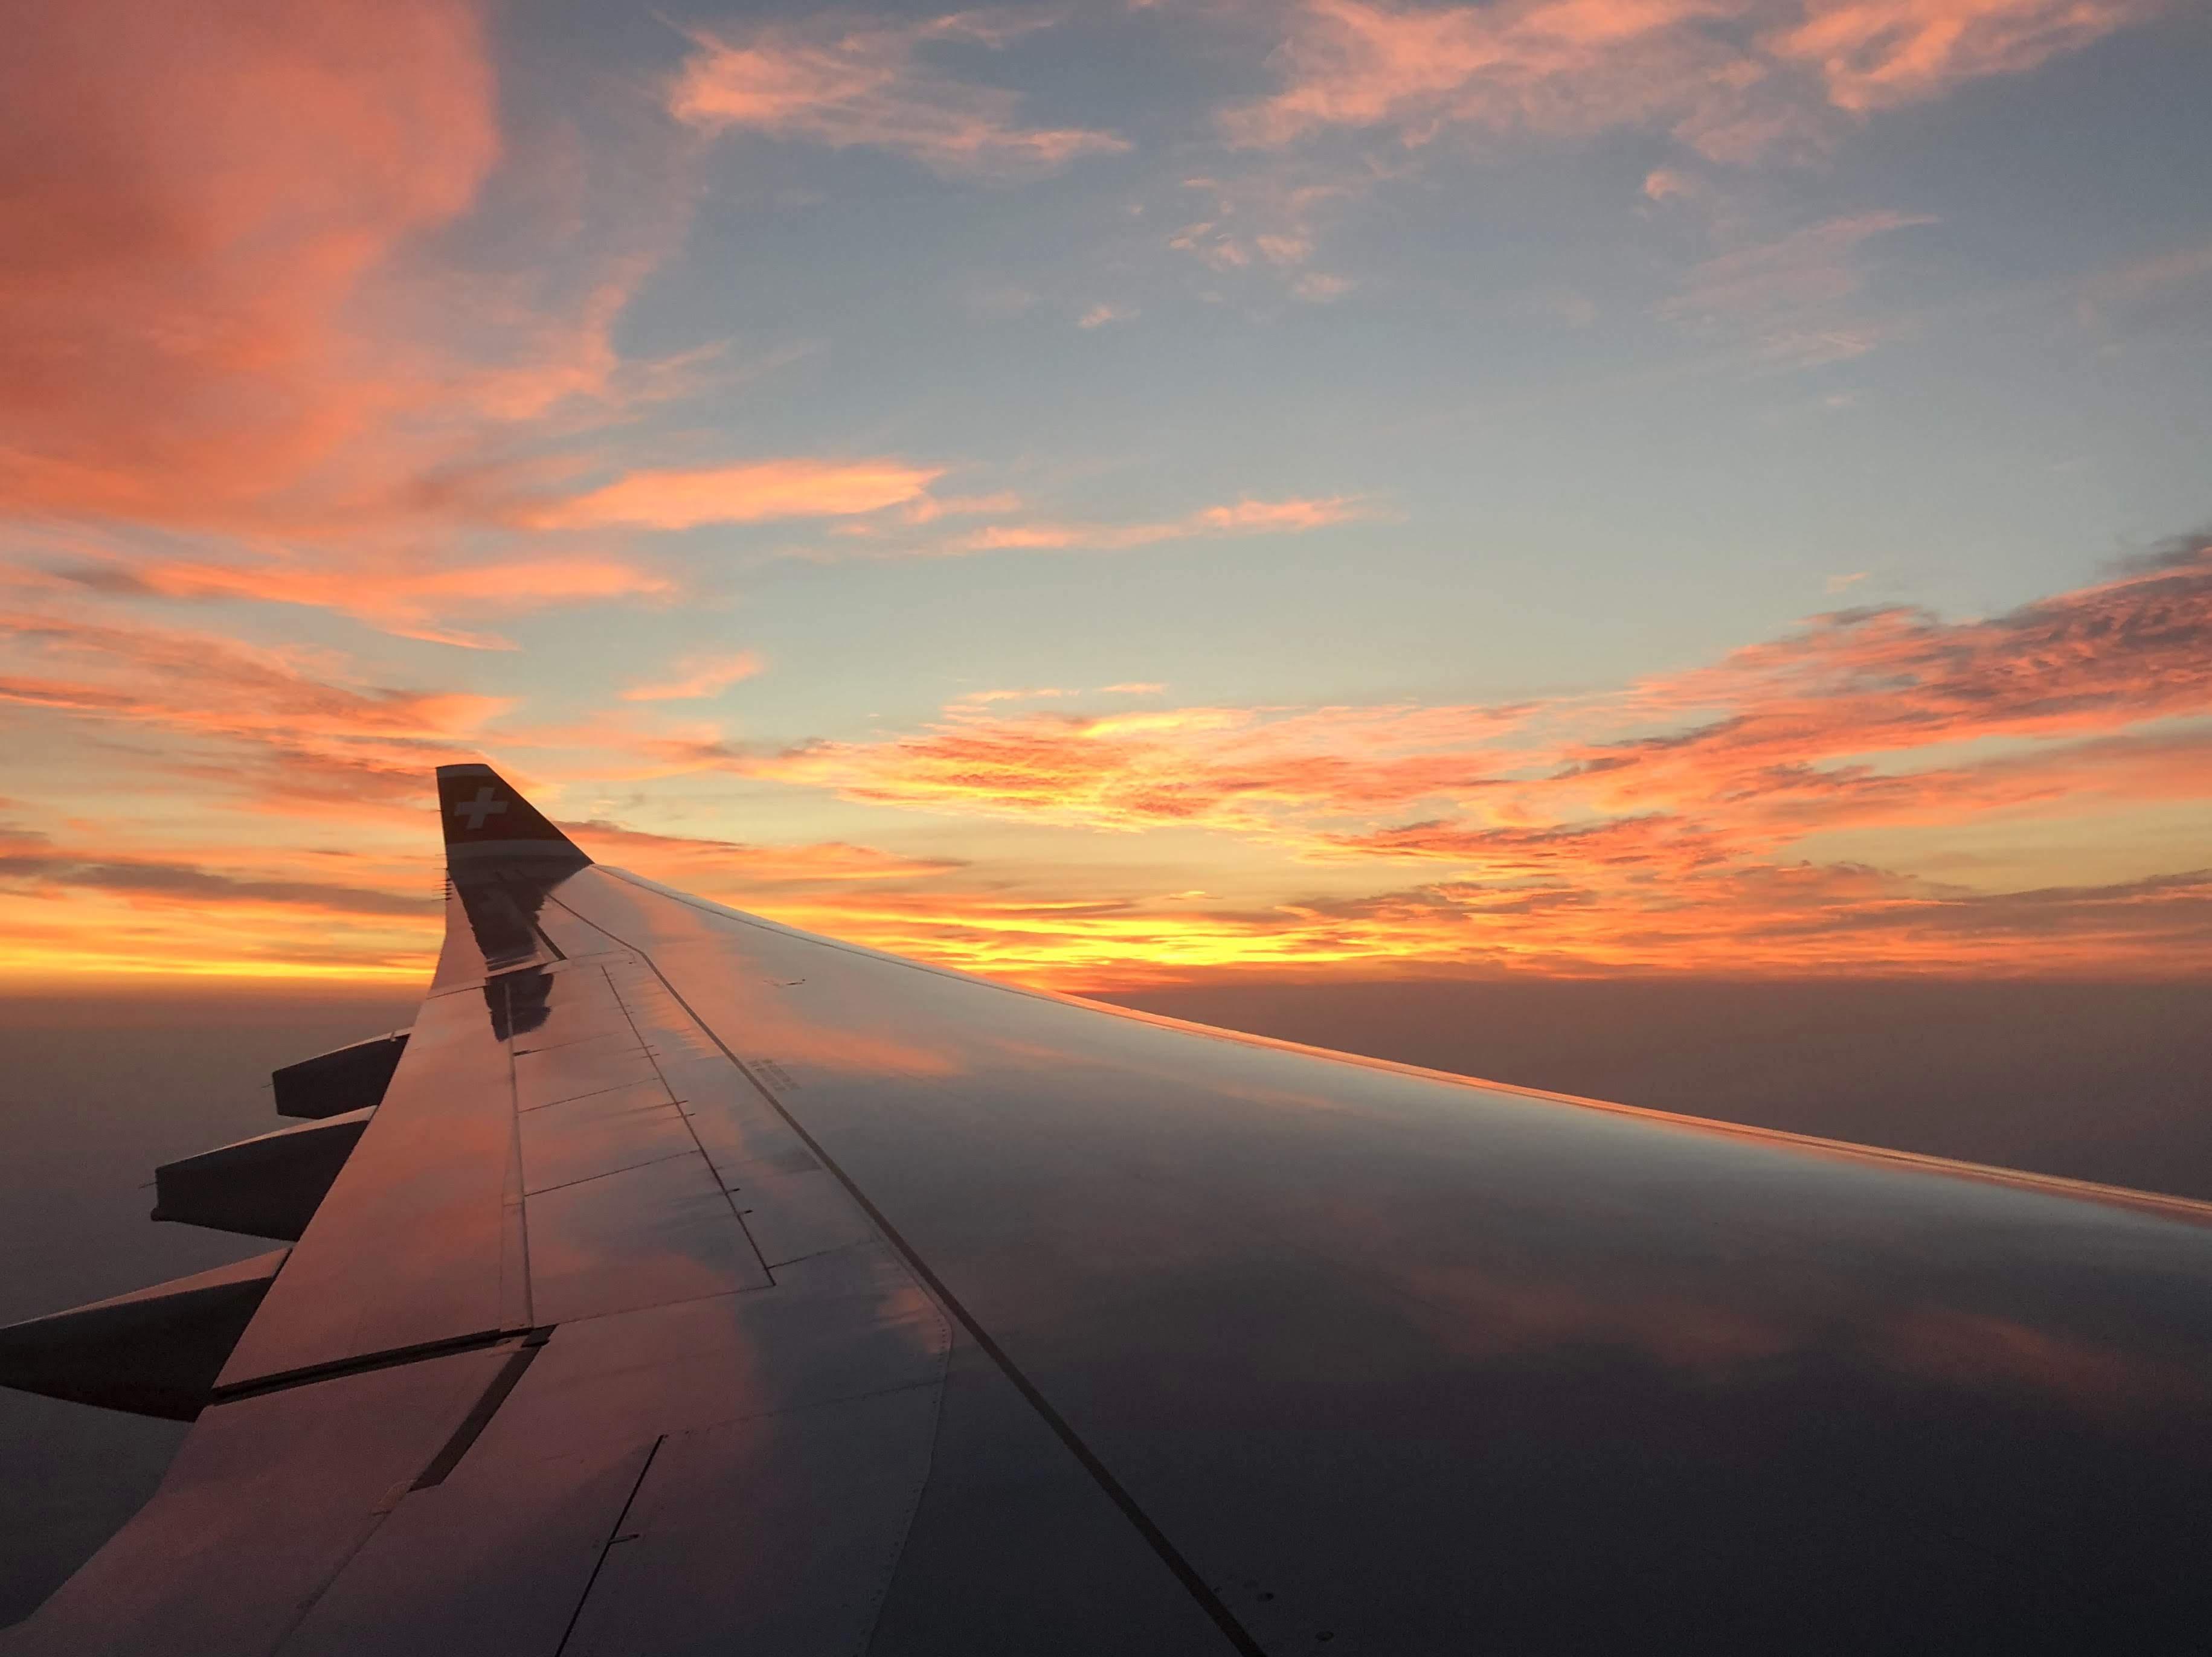 gray aircraft flying during orange sunset